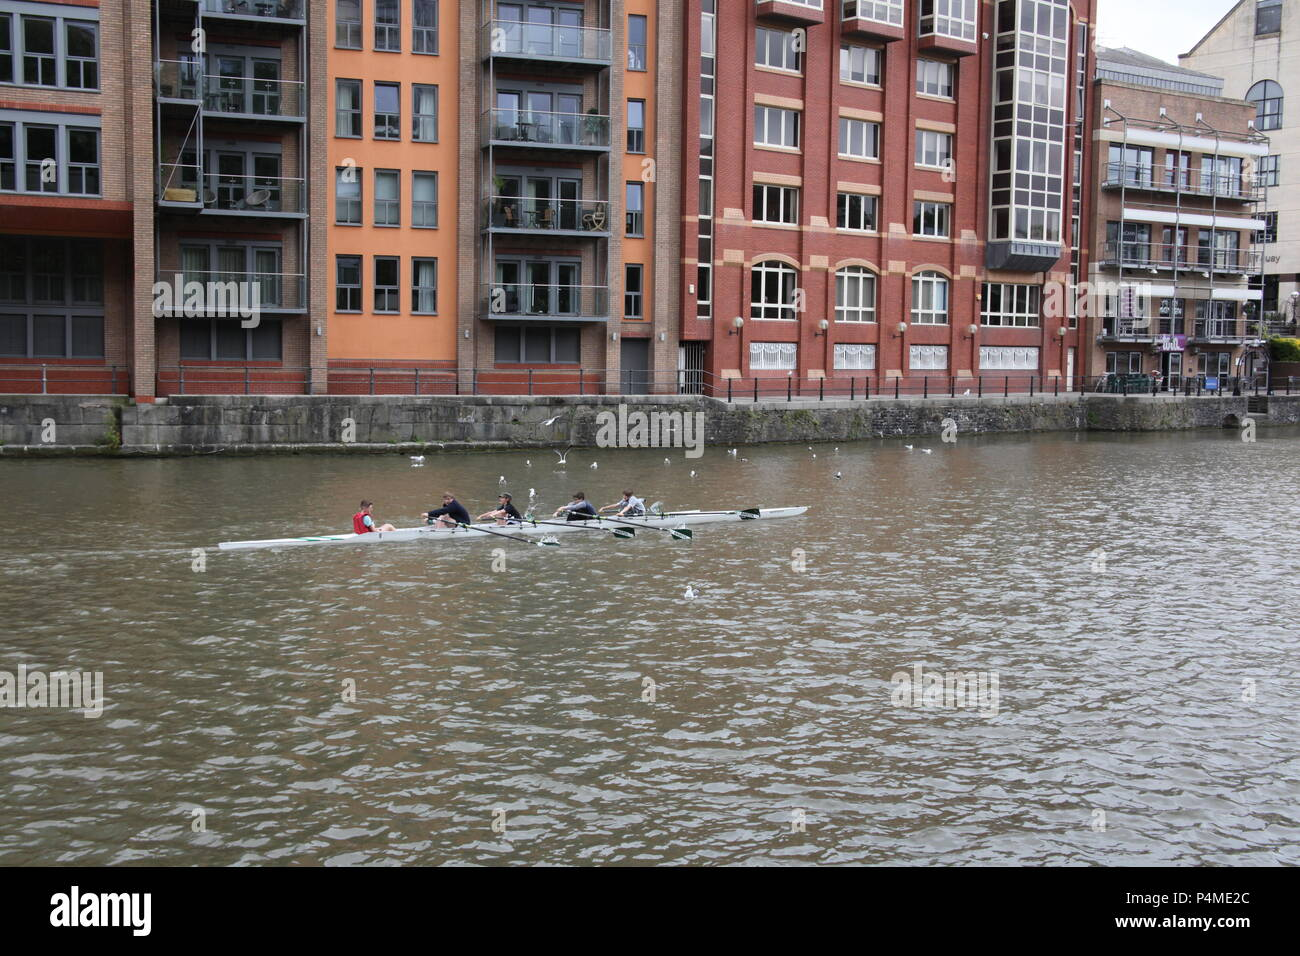 Children rowing on the River Avon, Bristol, England. - Stock Image